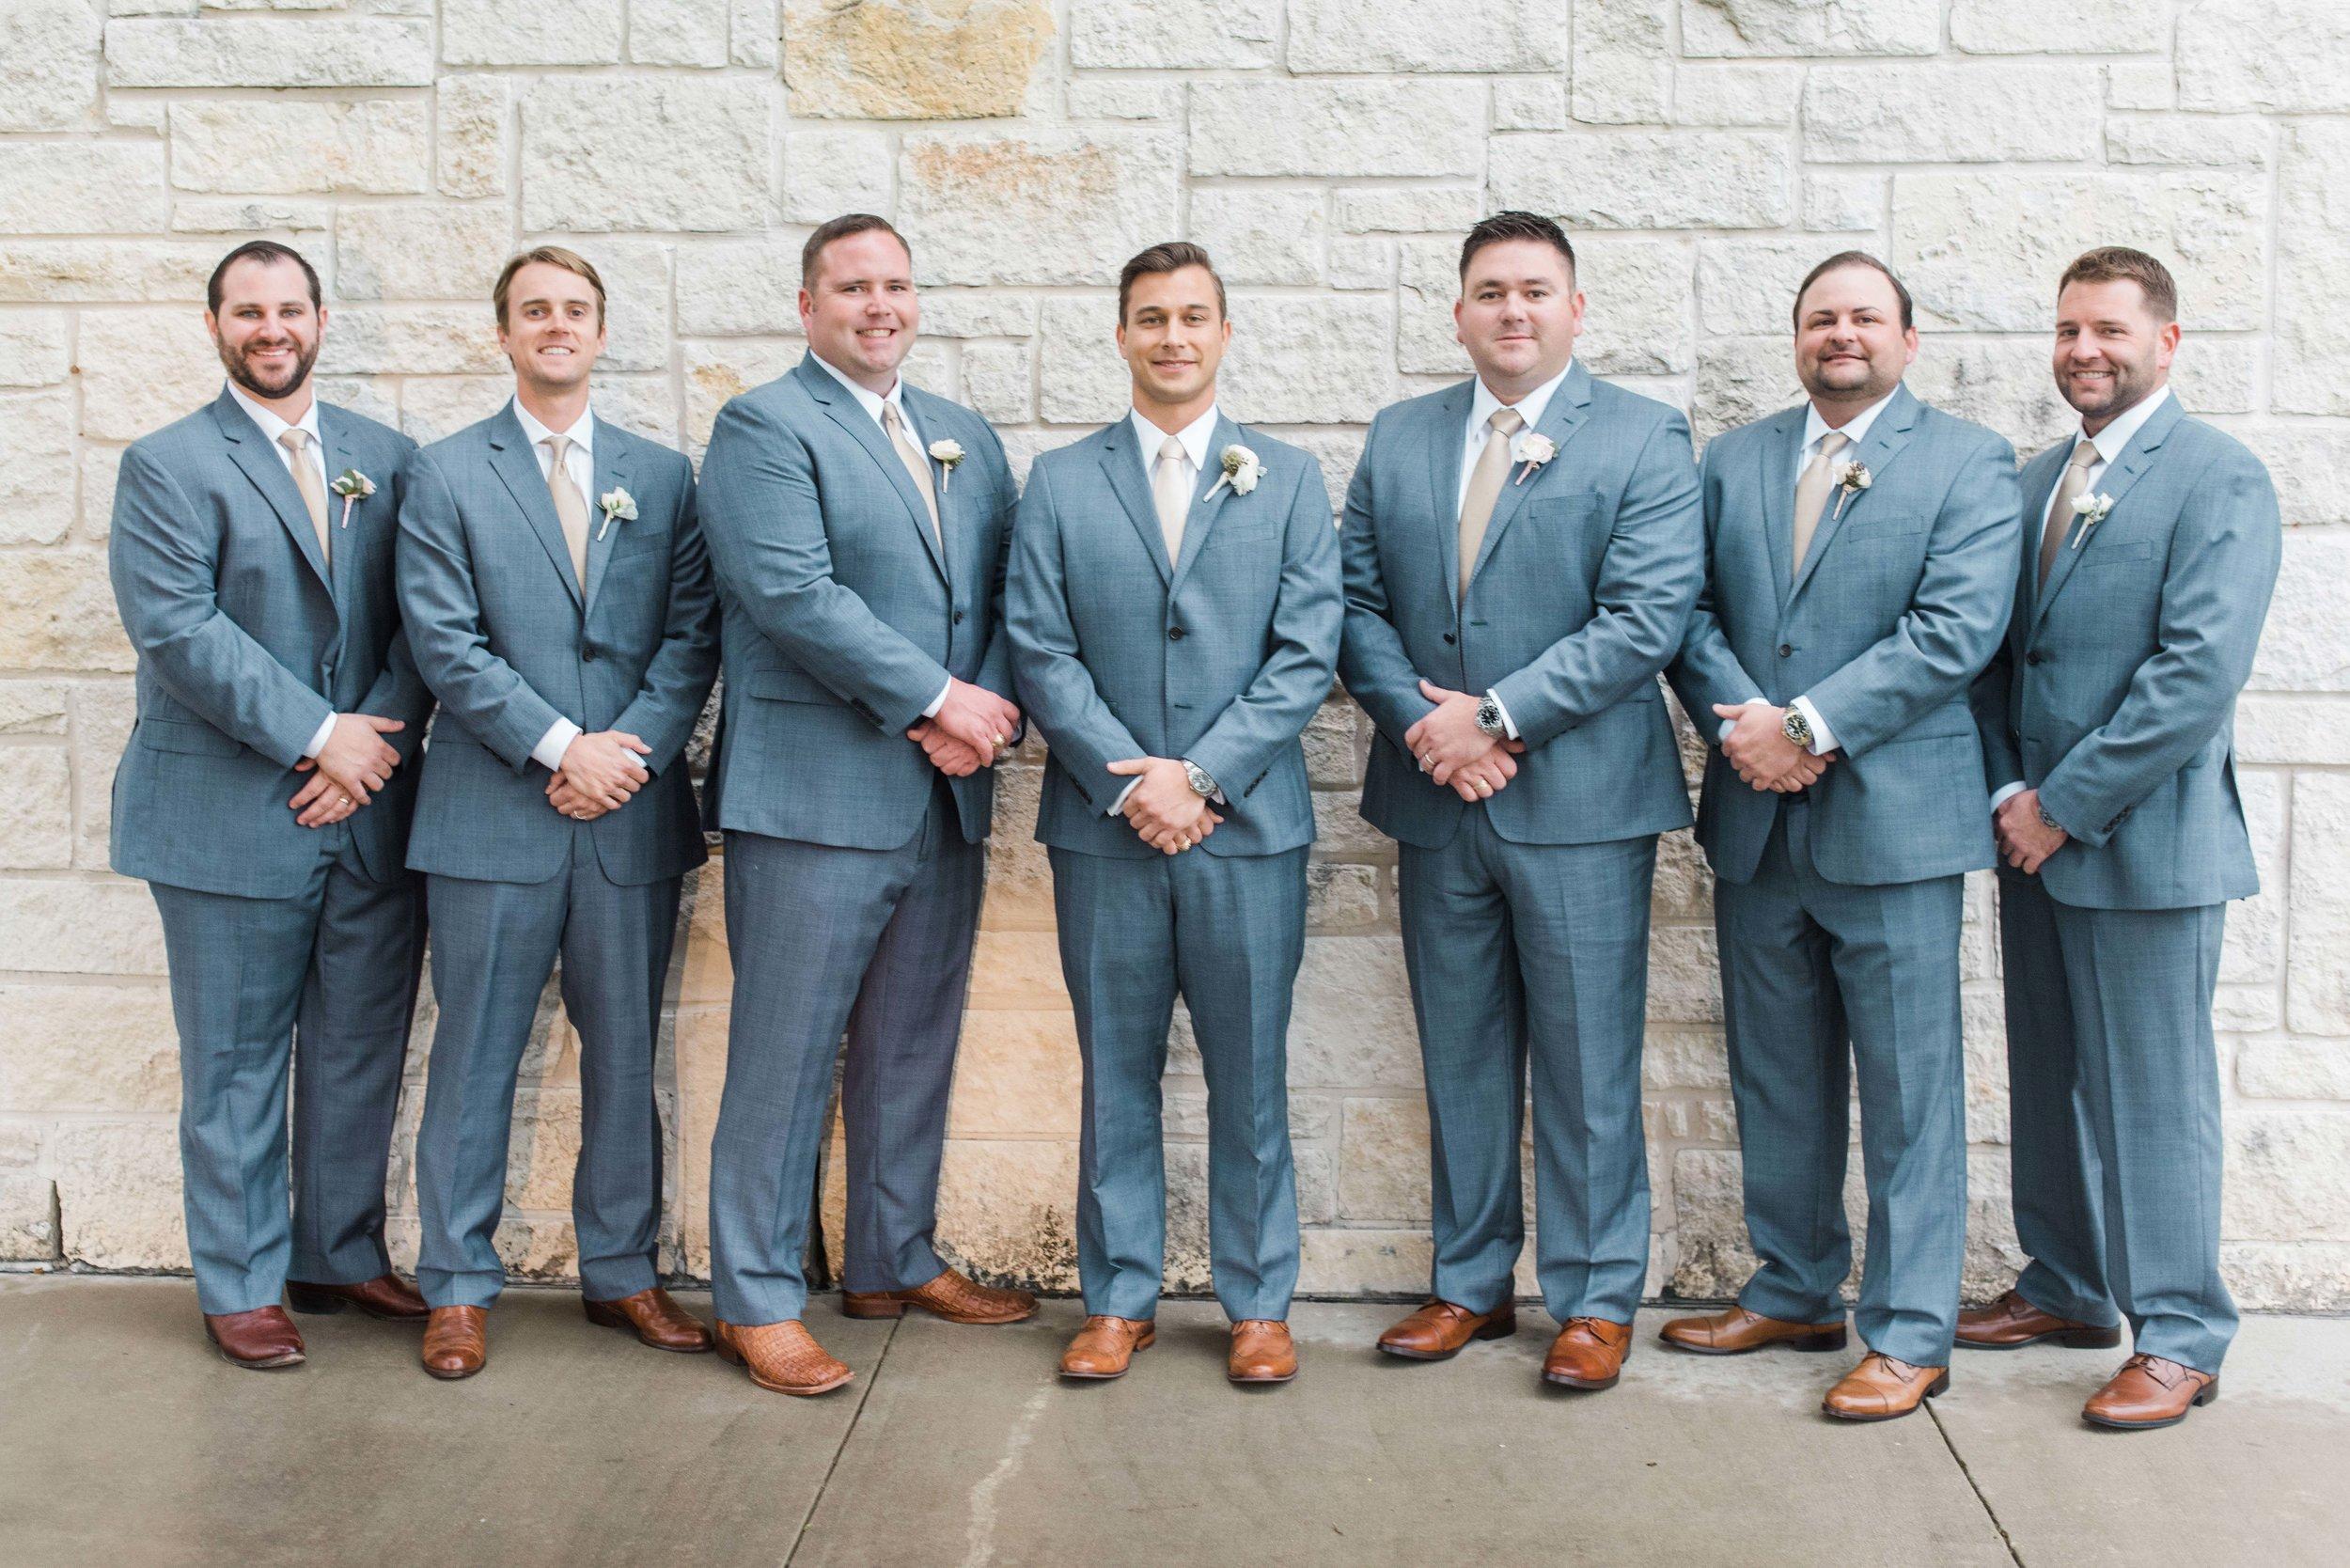 Briscoe-Manor-Houston-Wedding-Photographer-Modern-Luxury-Weddings-Dana-Fernandez-Photograpy-Fine-Art-Photographer-Houston-Film-Destination-PNW-Wedding-Photographer-8.jpg